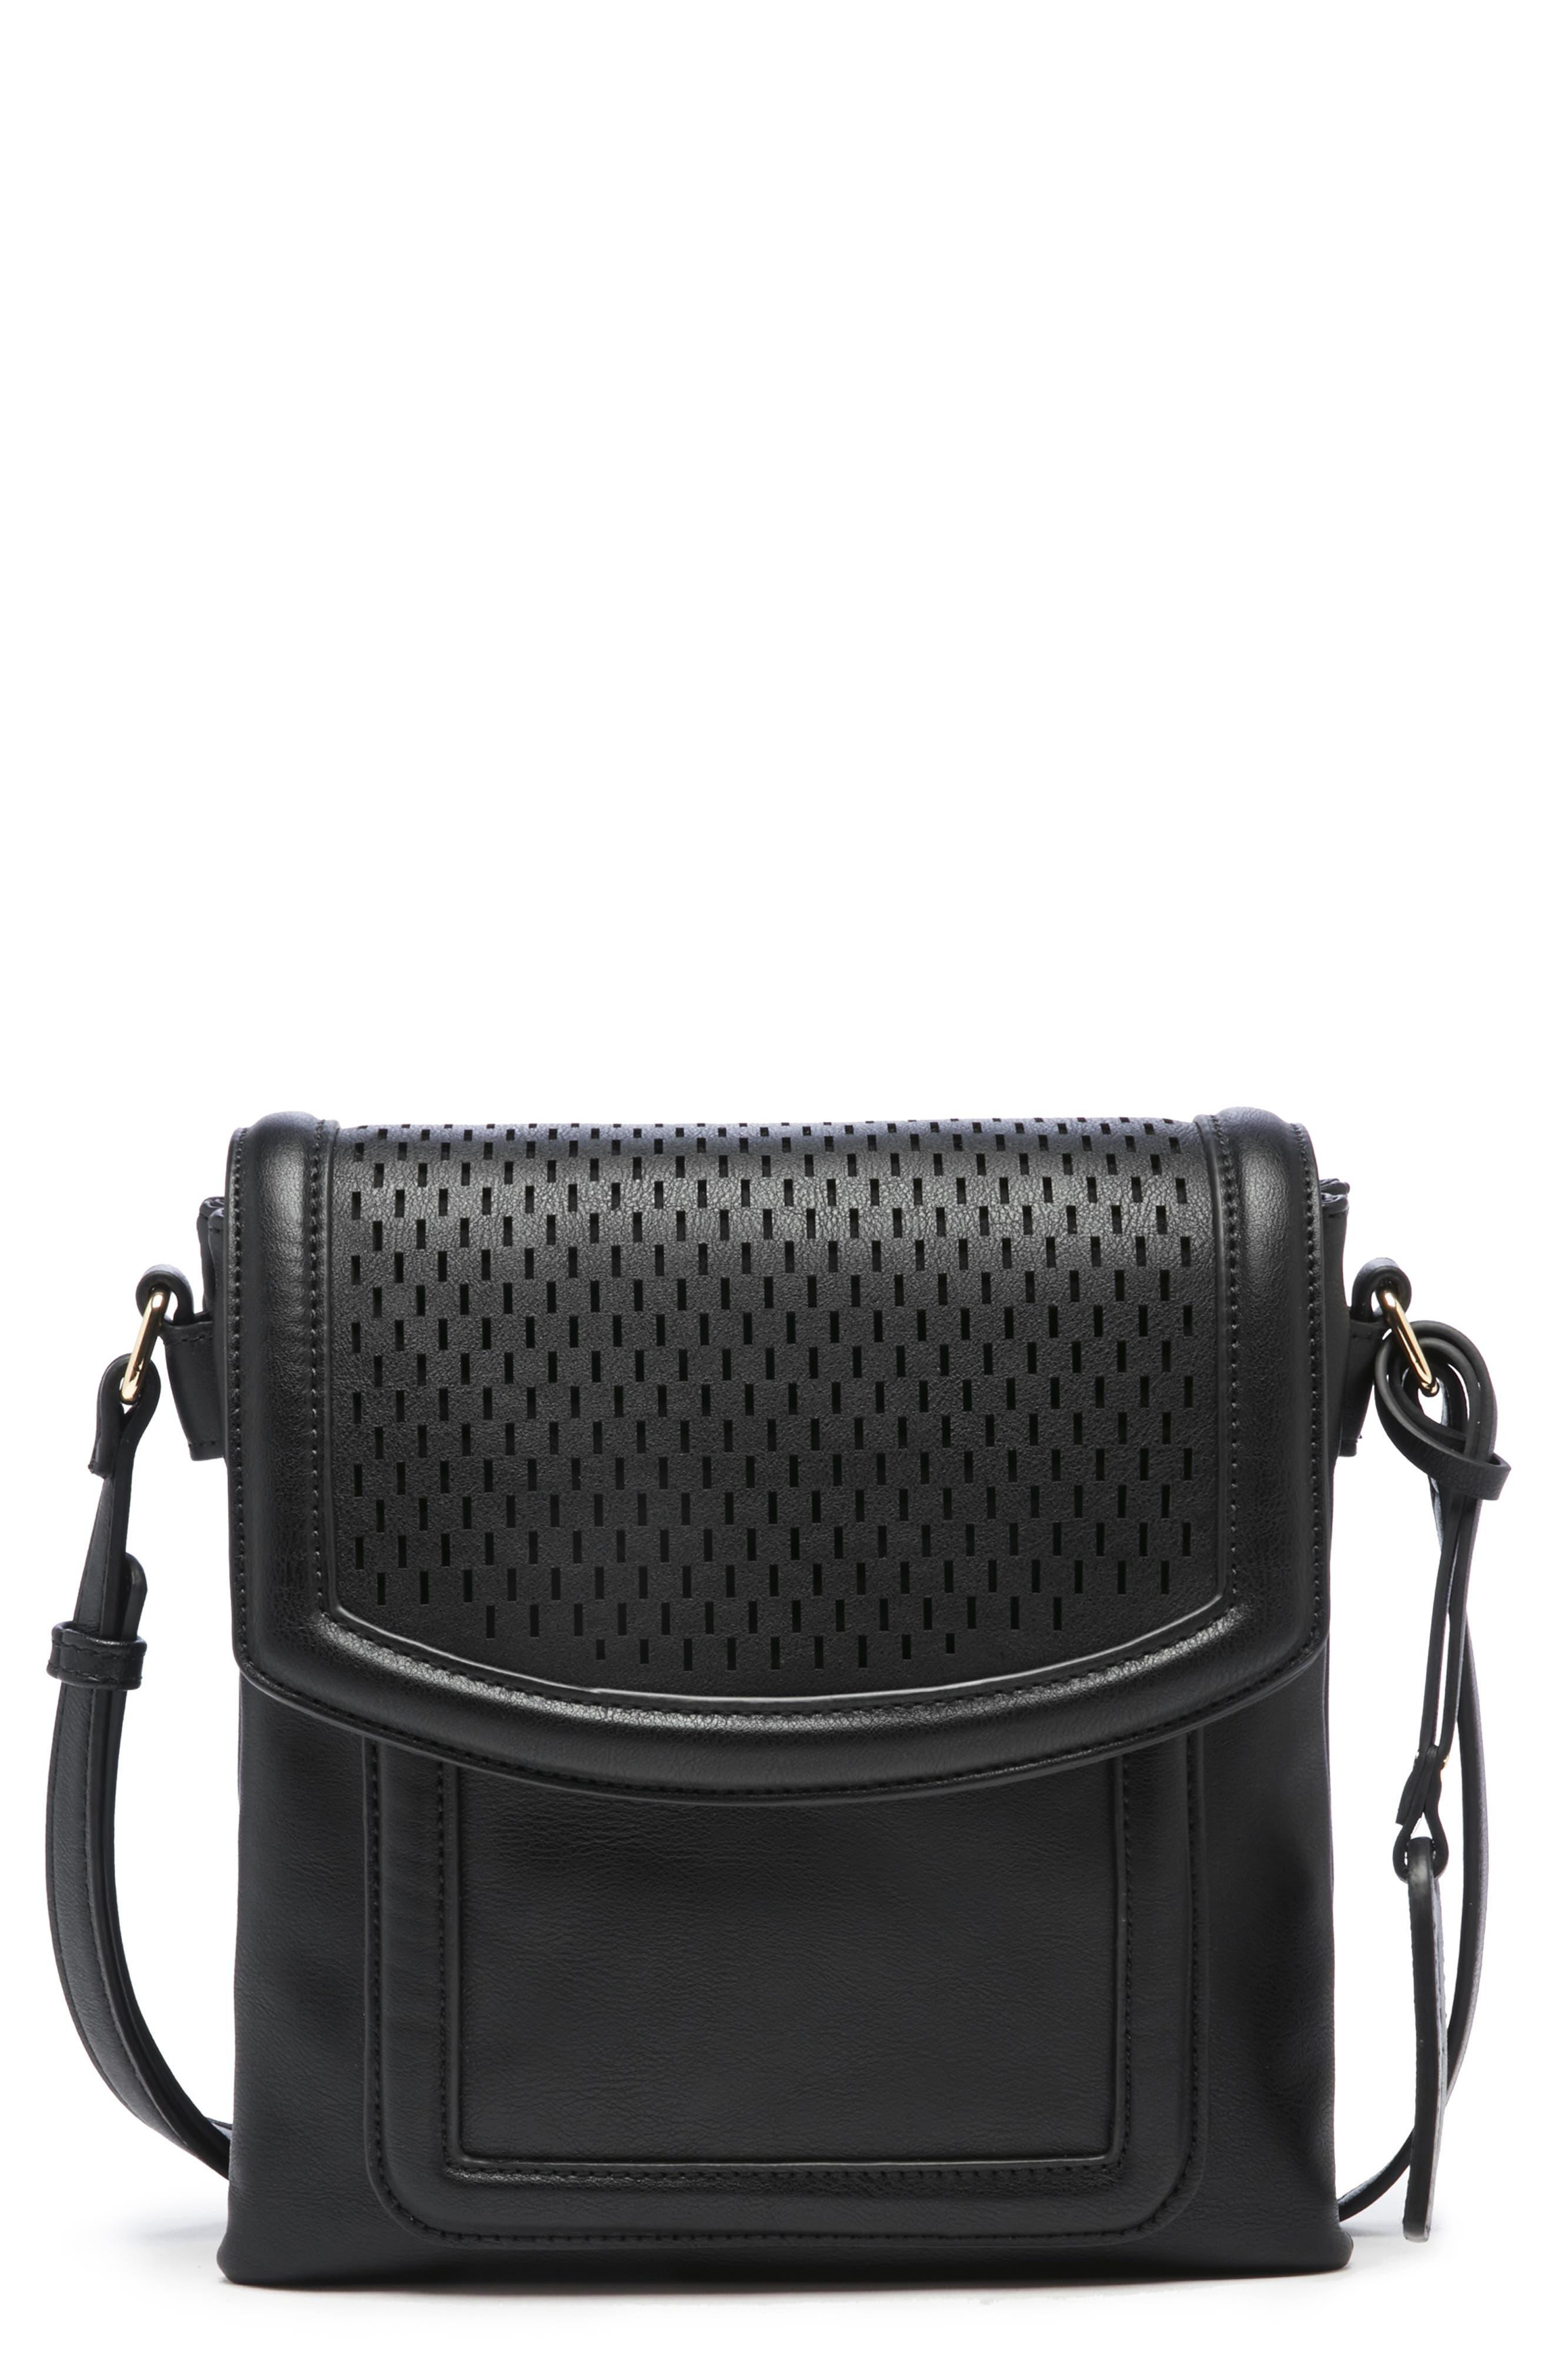 SOLE SOCIETY,                             Daisa Faux Leather Crossbody Bag,                             Main thumbnail 1, color,                             001